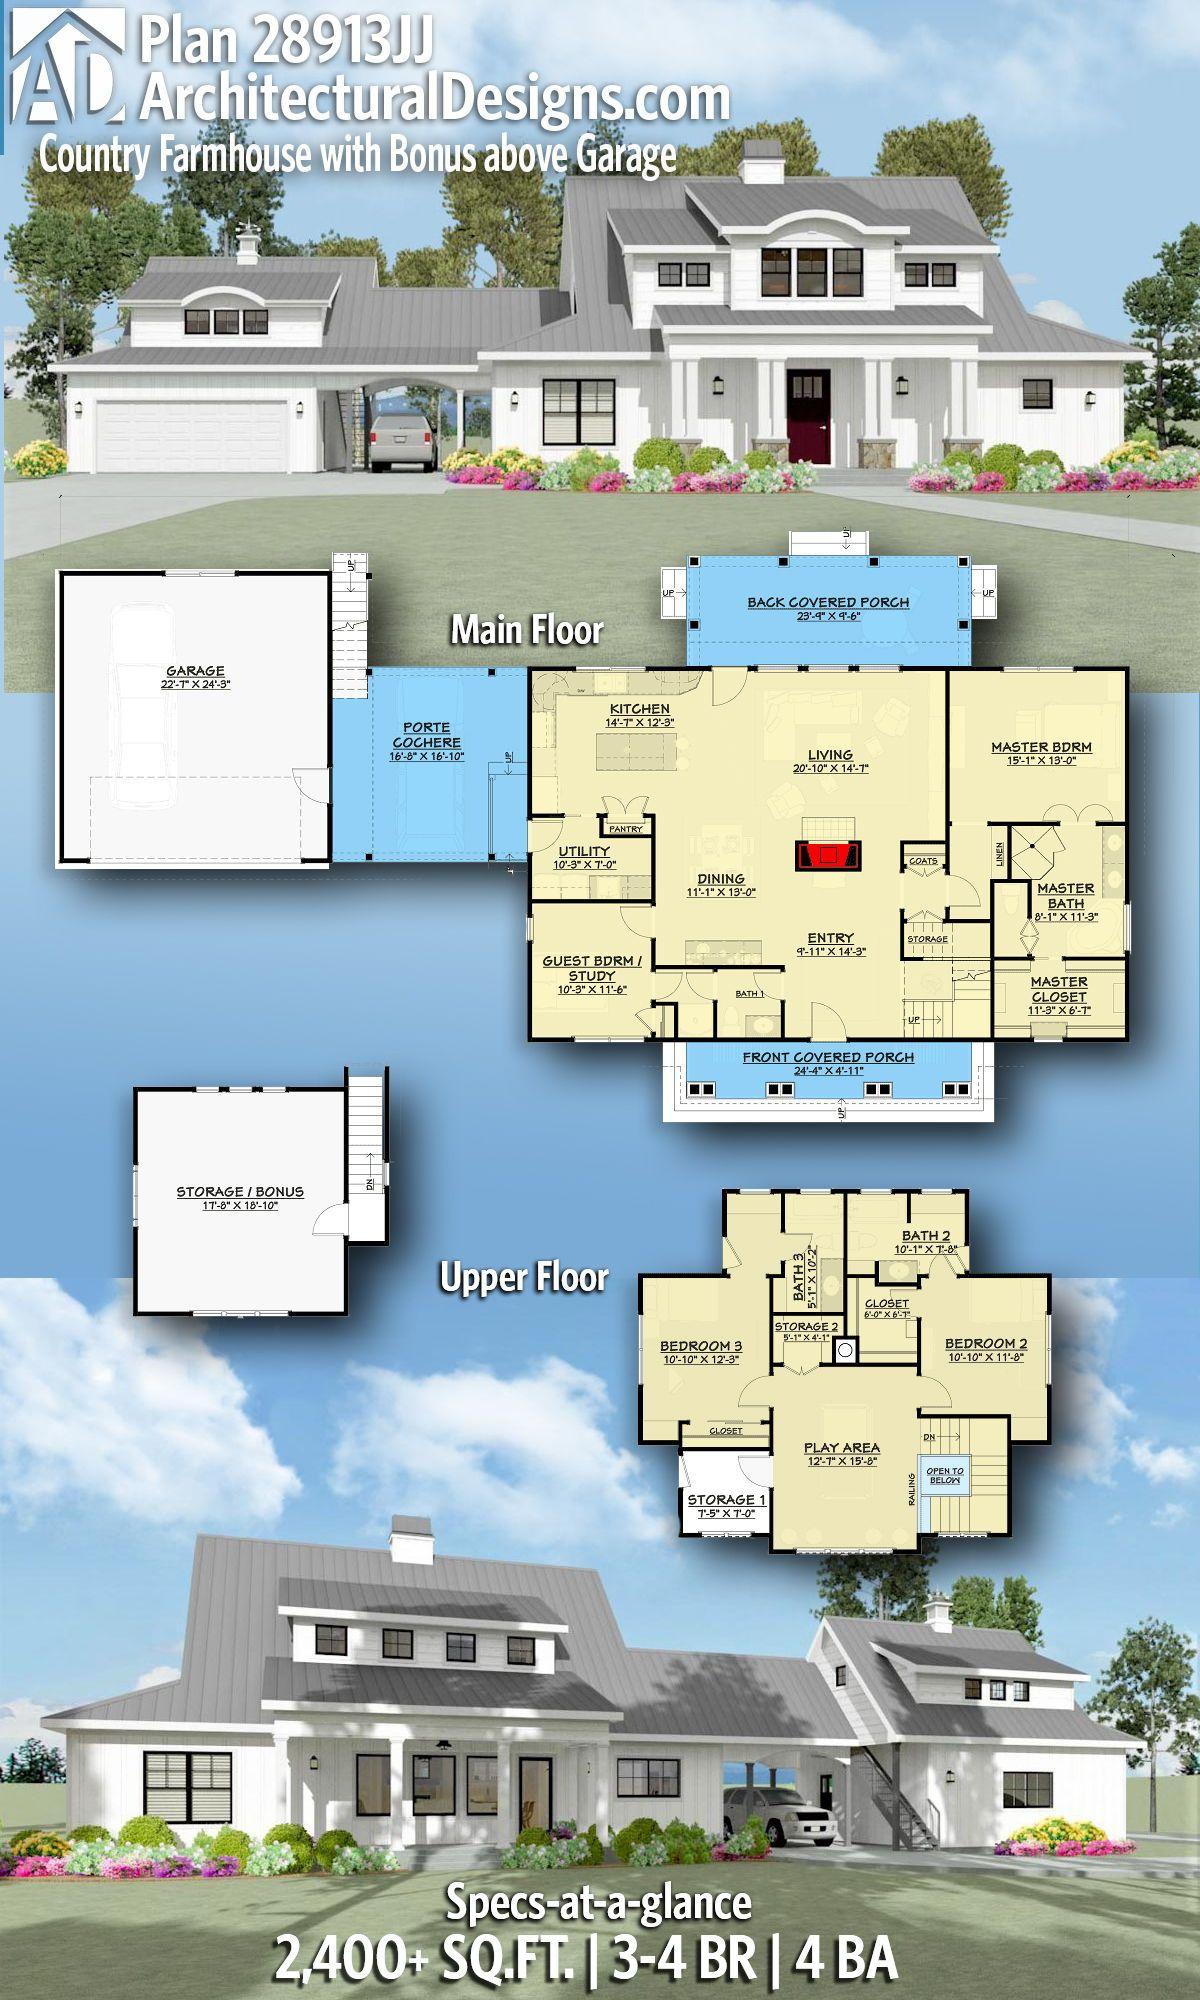 Plan 28913jj Country Farmhouse With Bonus Above Garage House Plans Farmhouse Dream House Plans House Plans